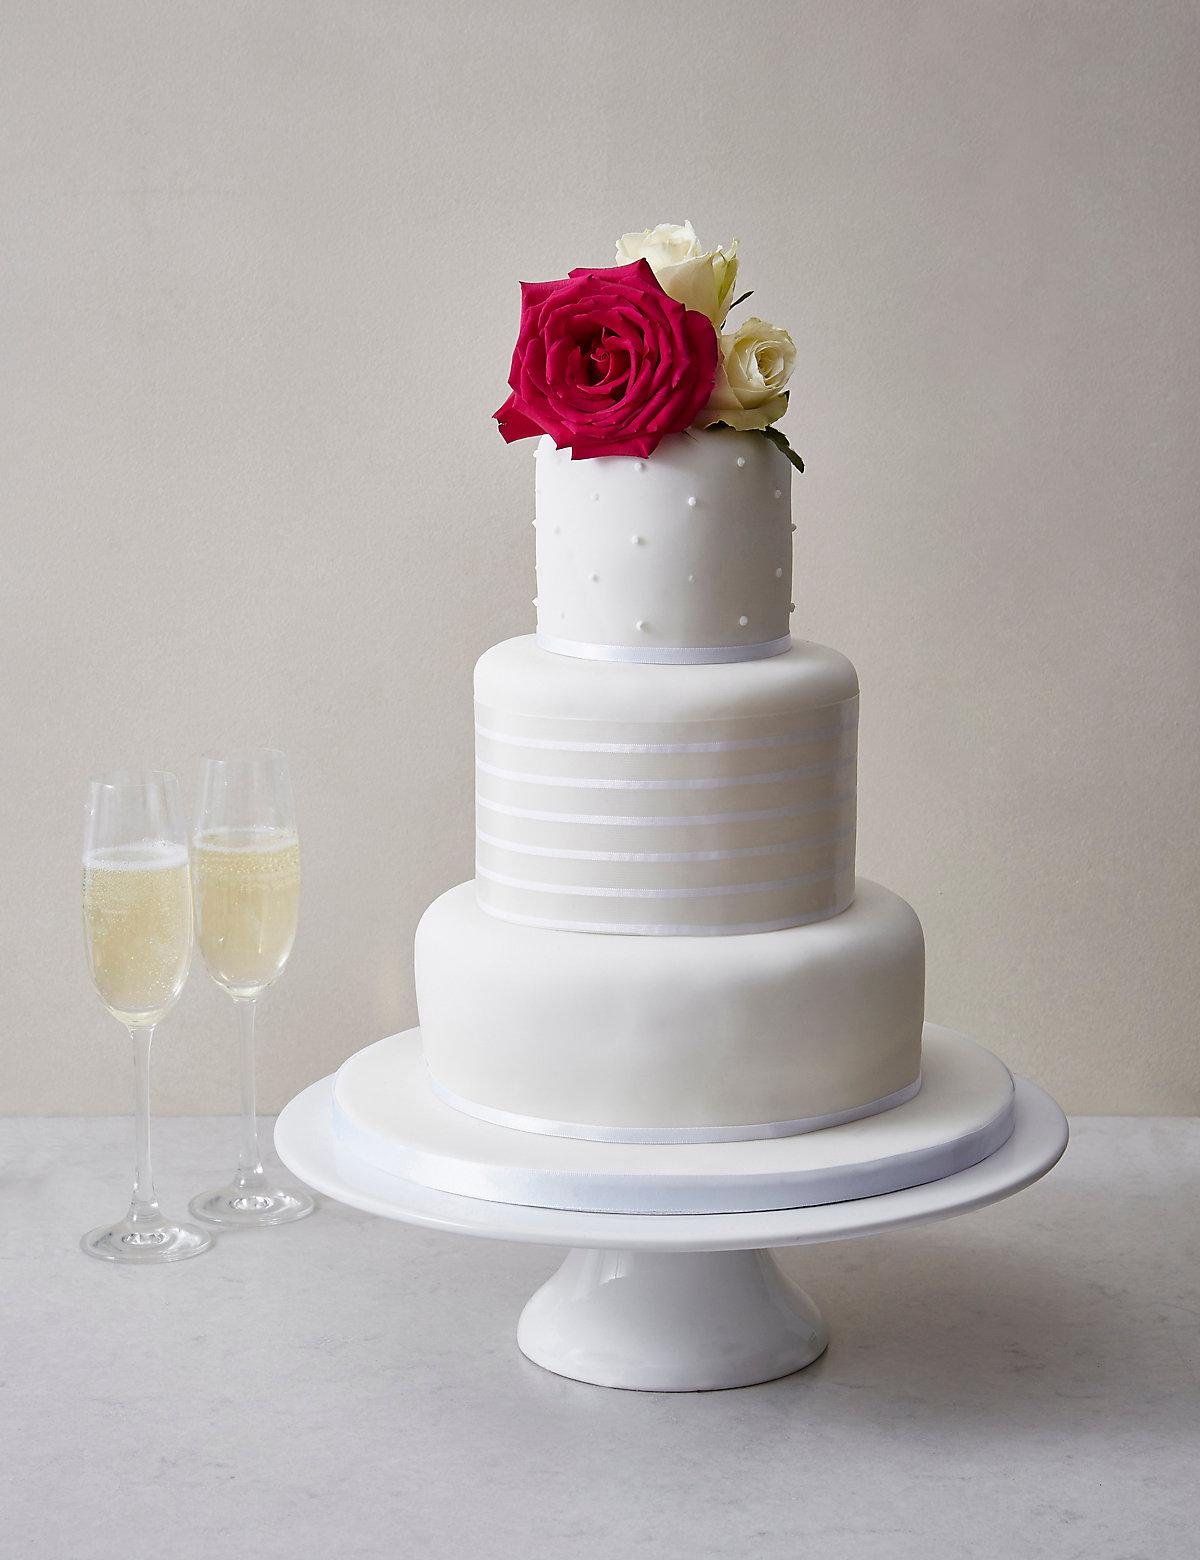 Kgb deals wedding cake